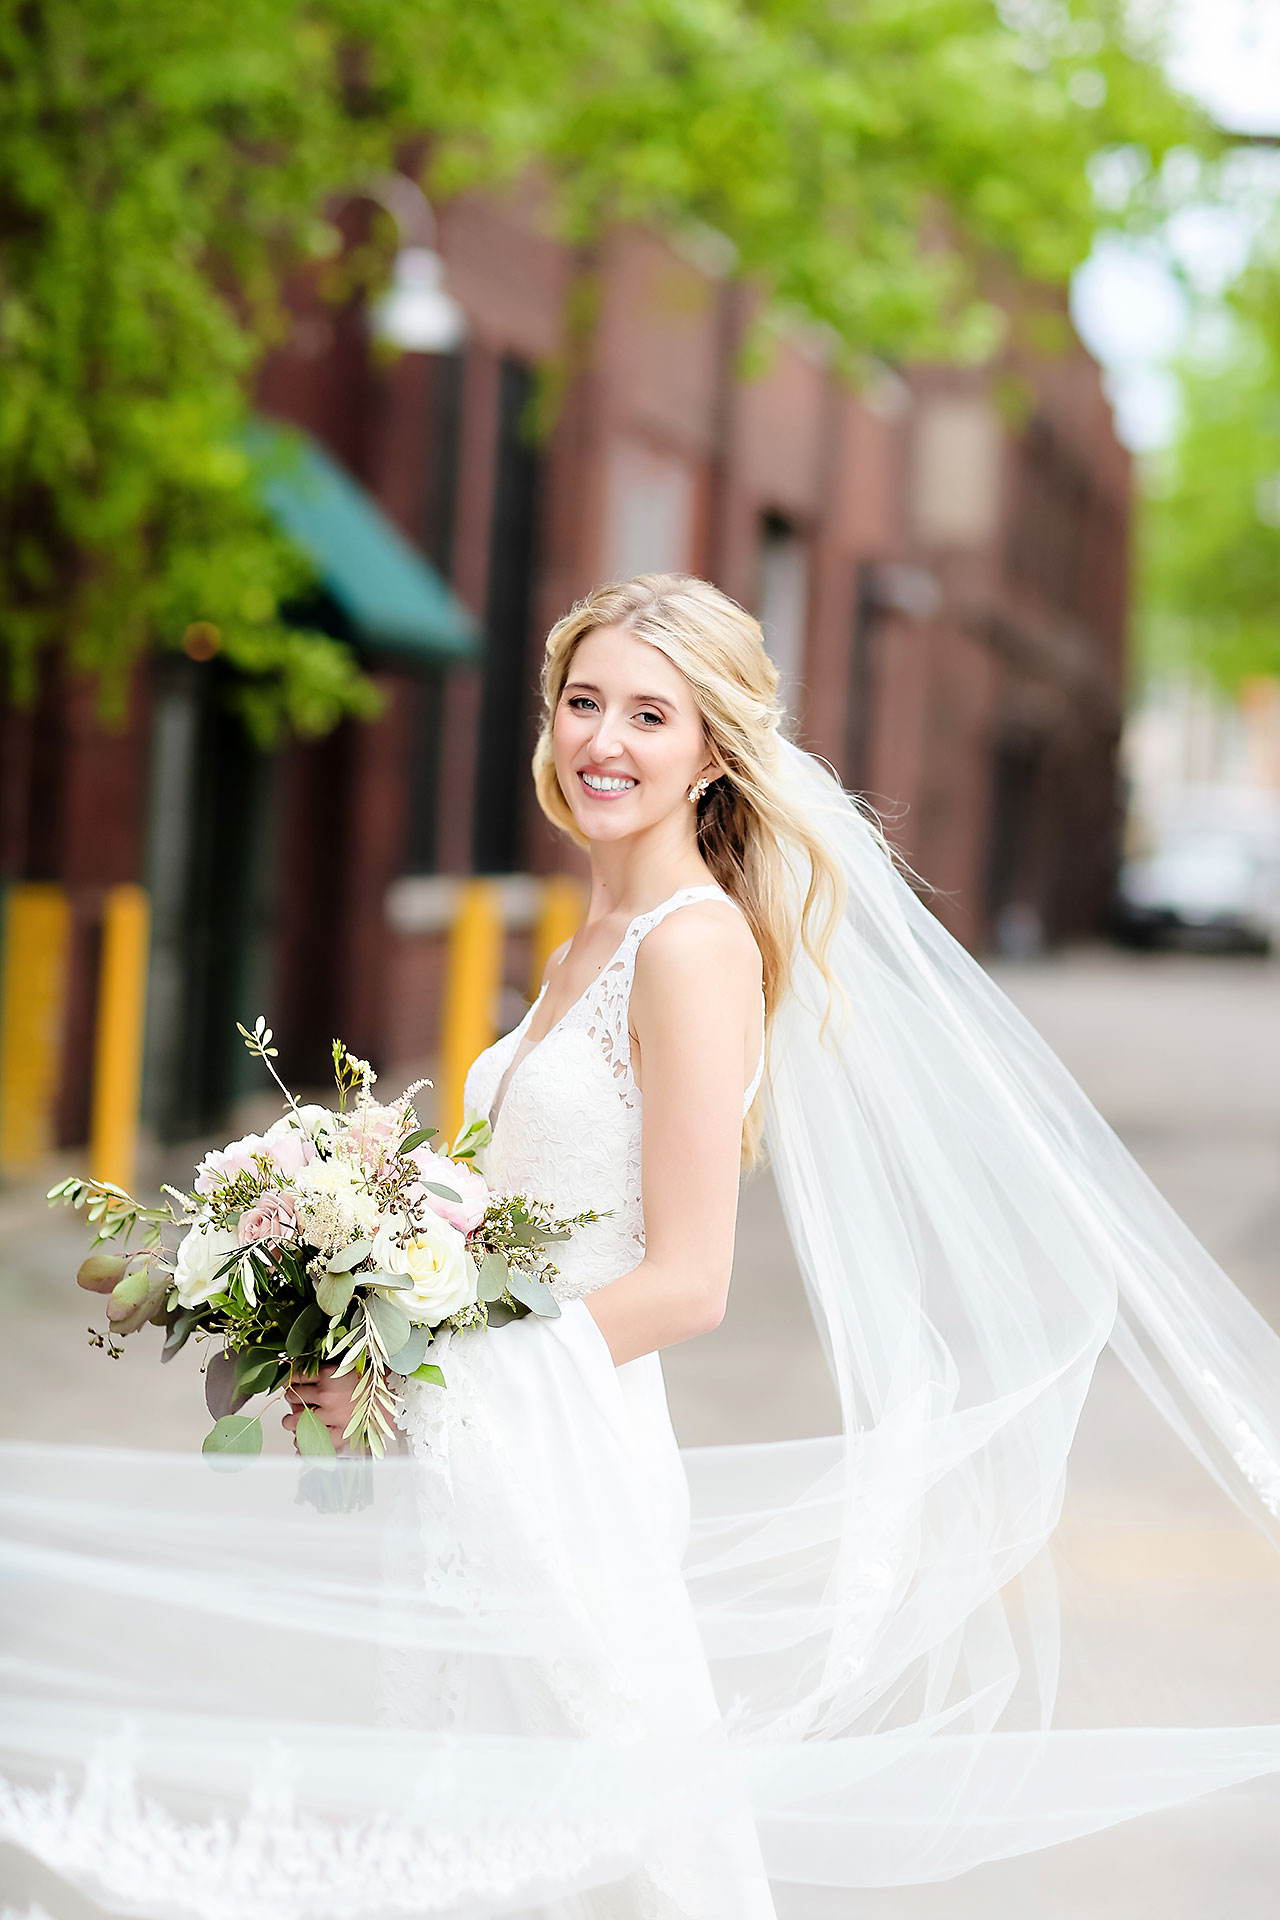 Allison Jeff Union Station Crowne Plaza Indianapolis wedding 133